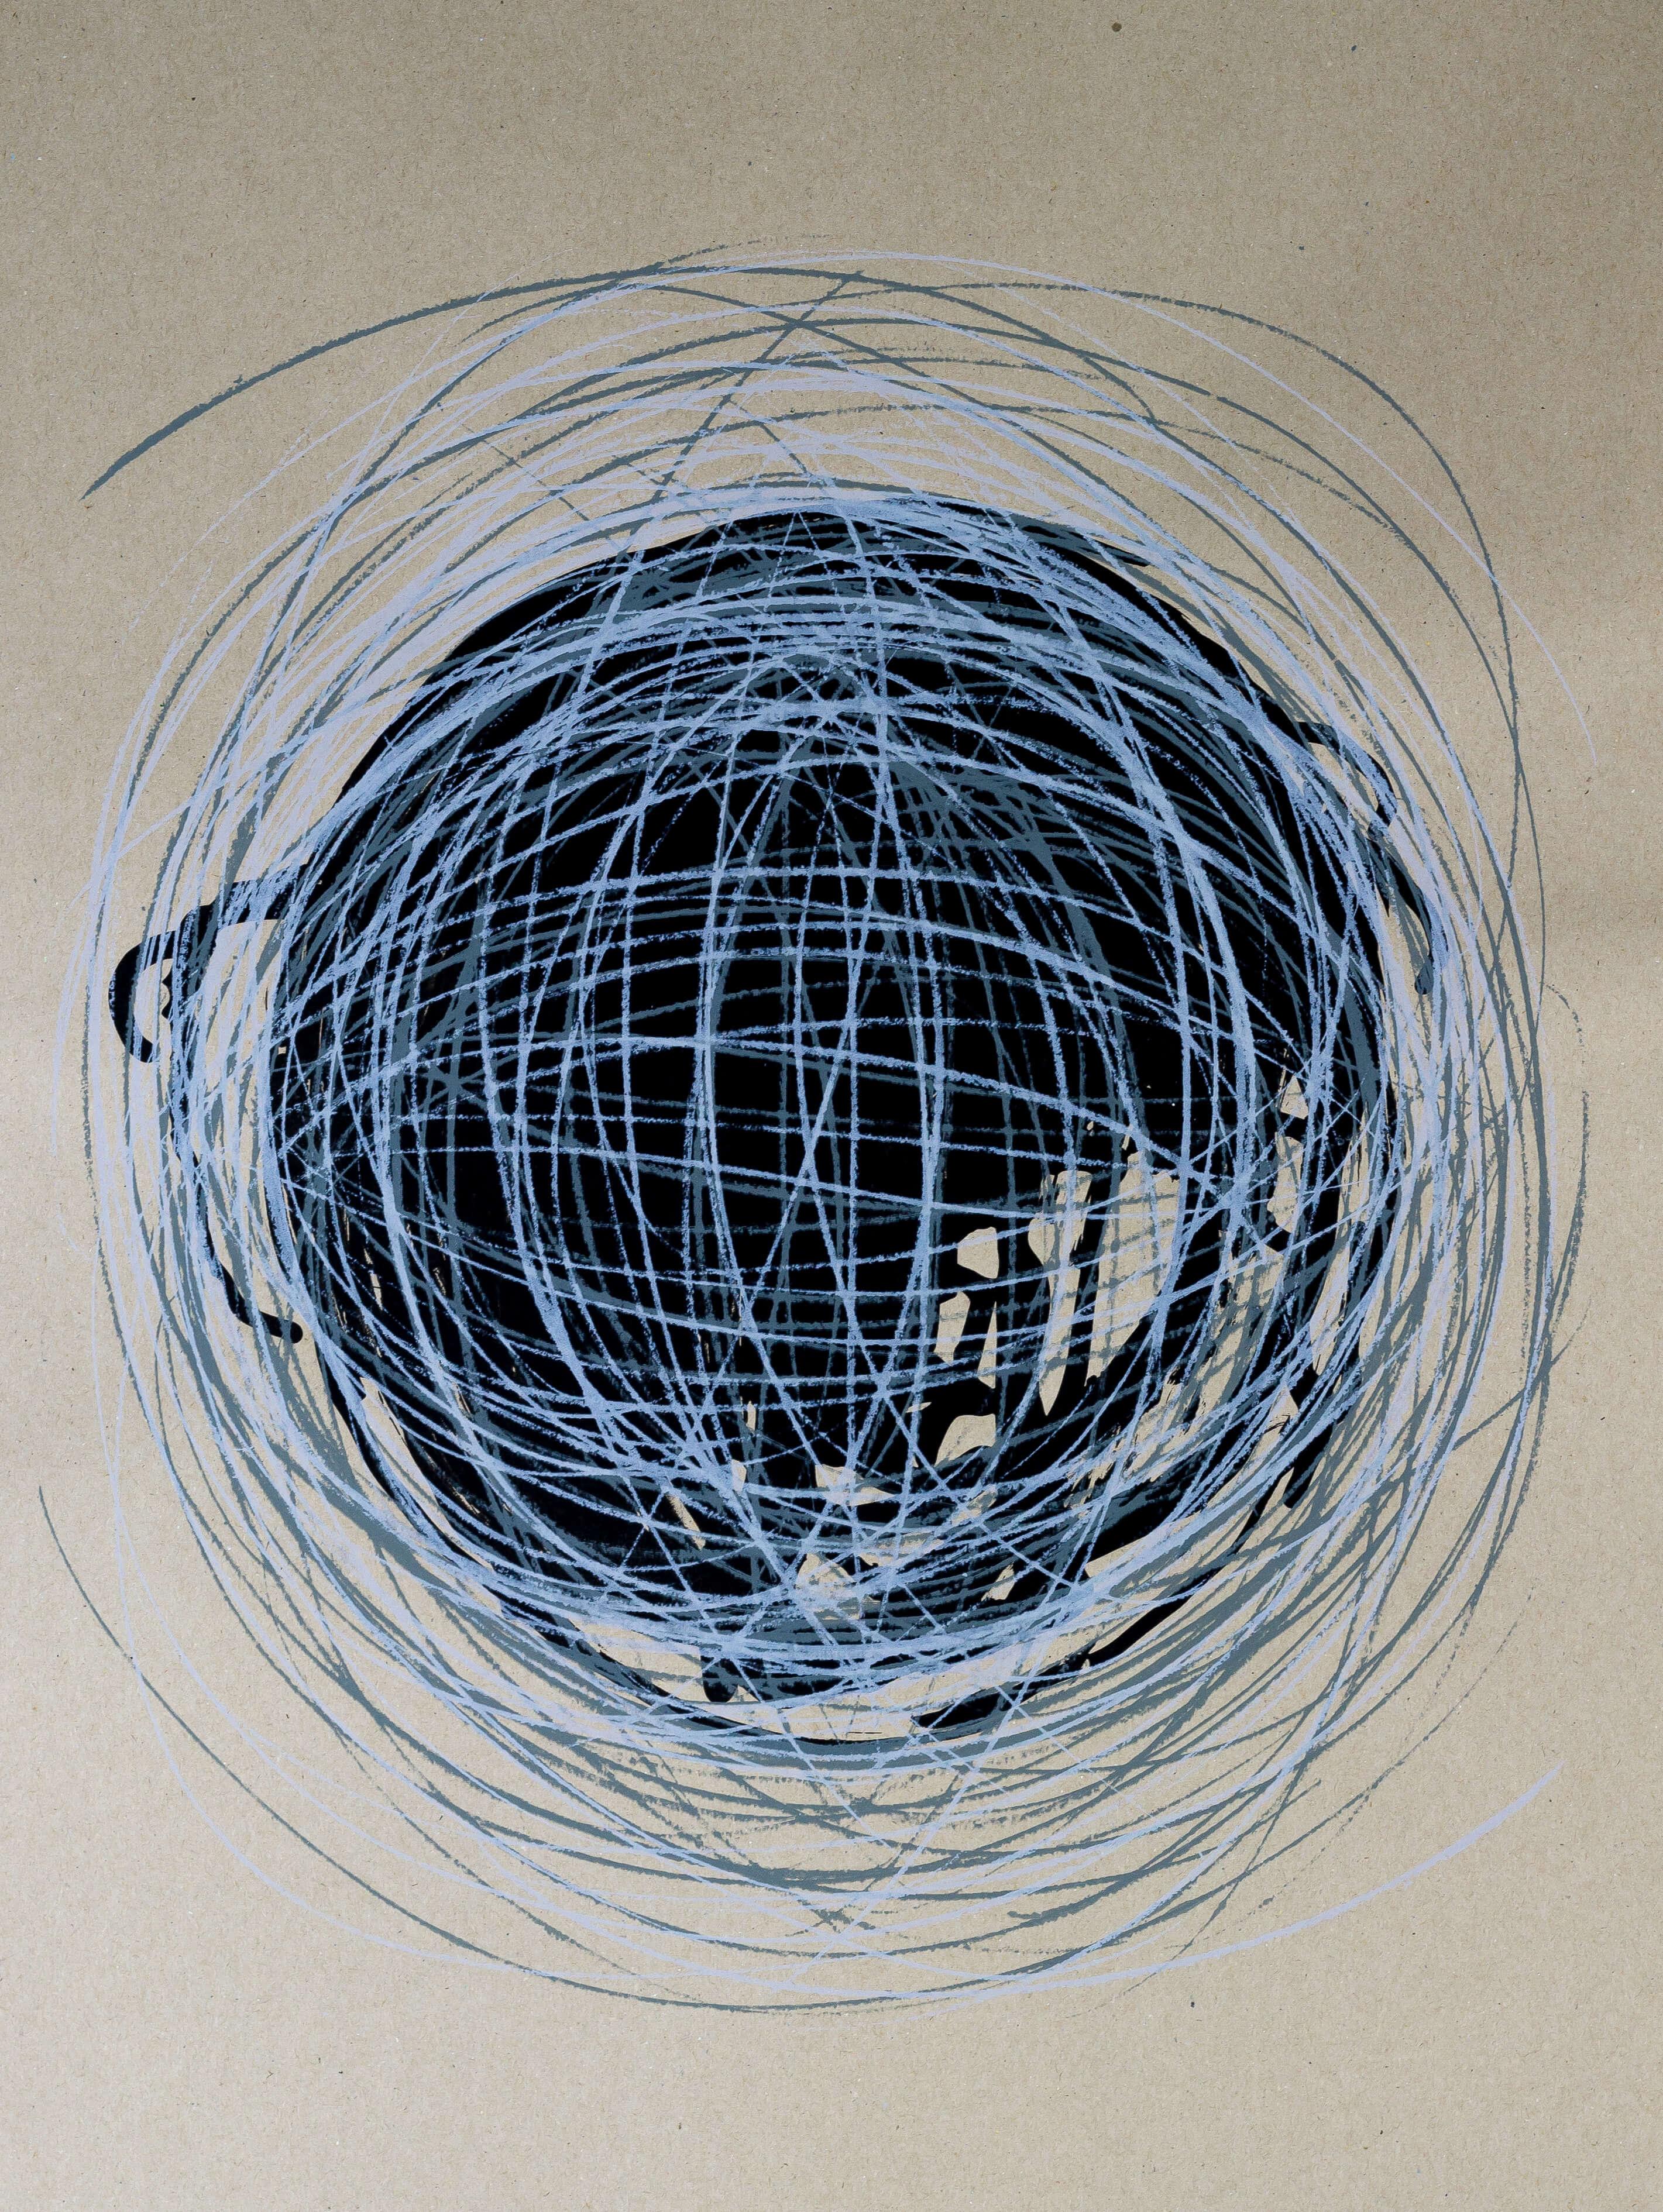 Katharina Albers, Transformation XXXV, 2011, Siebdruck, Unikat, 59,5x42cm